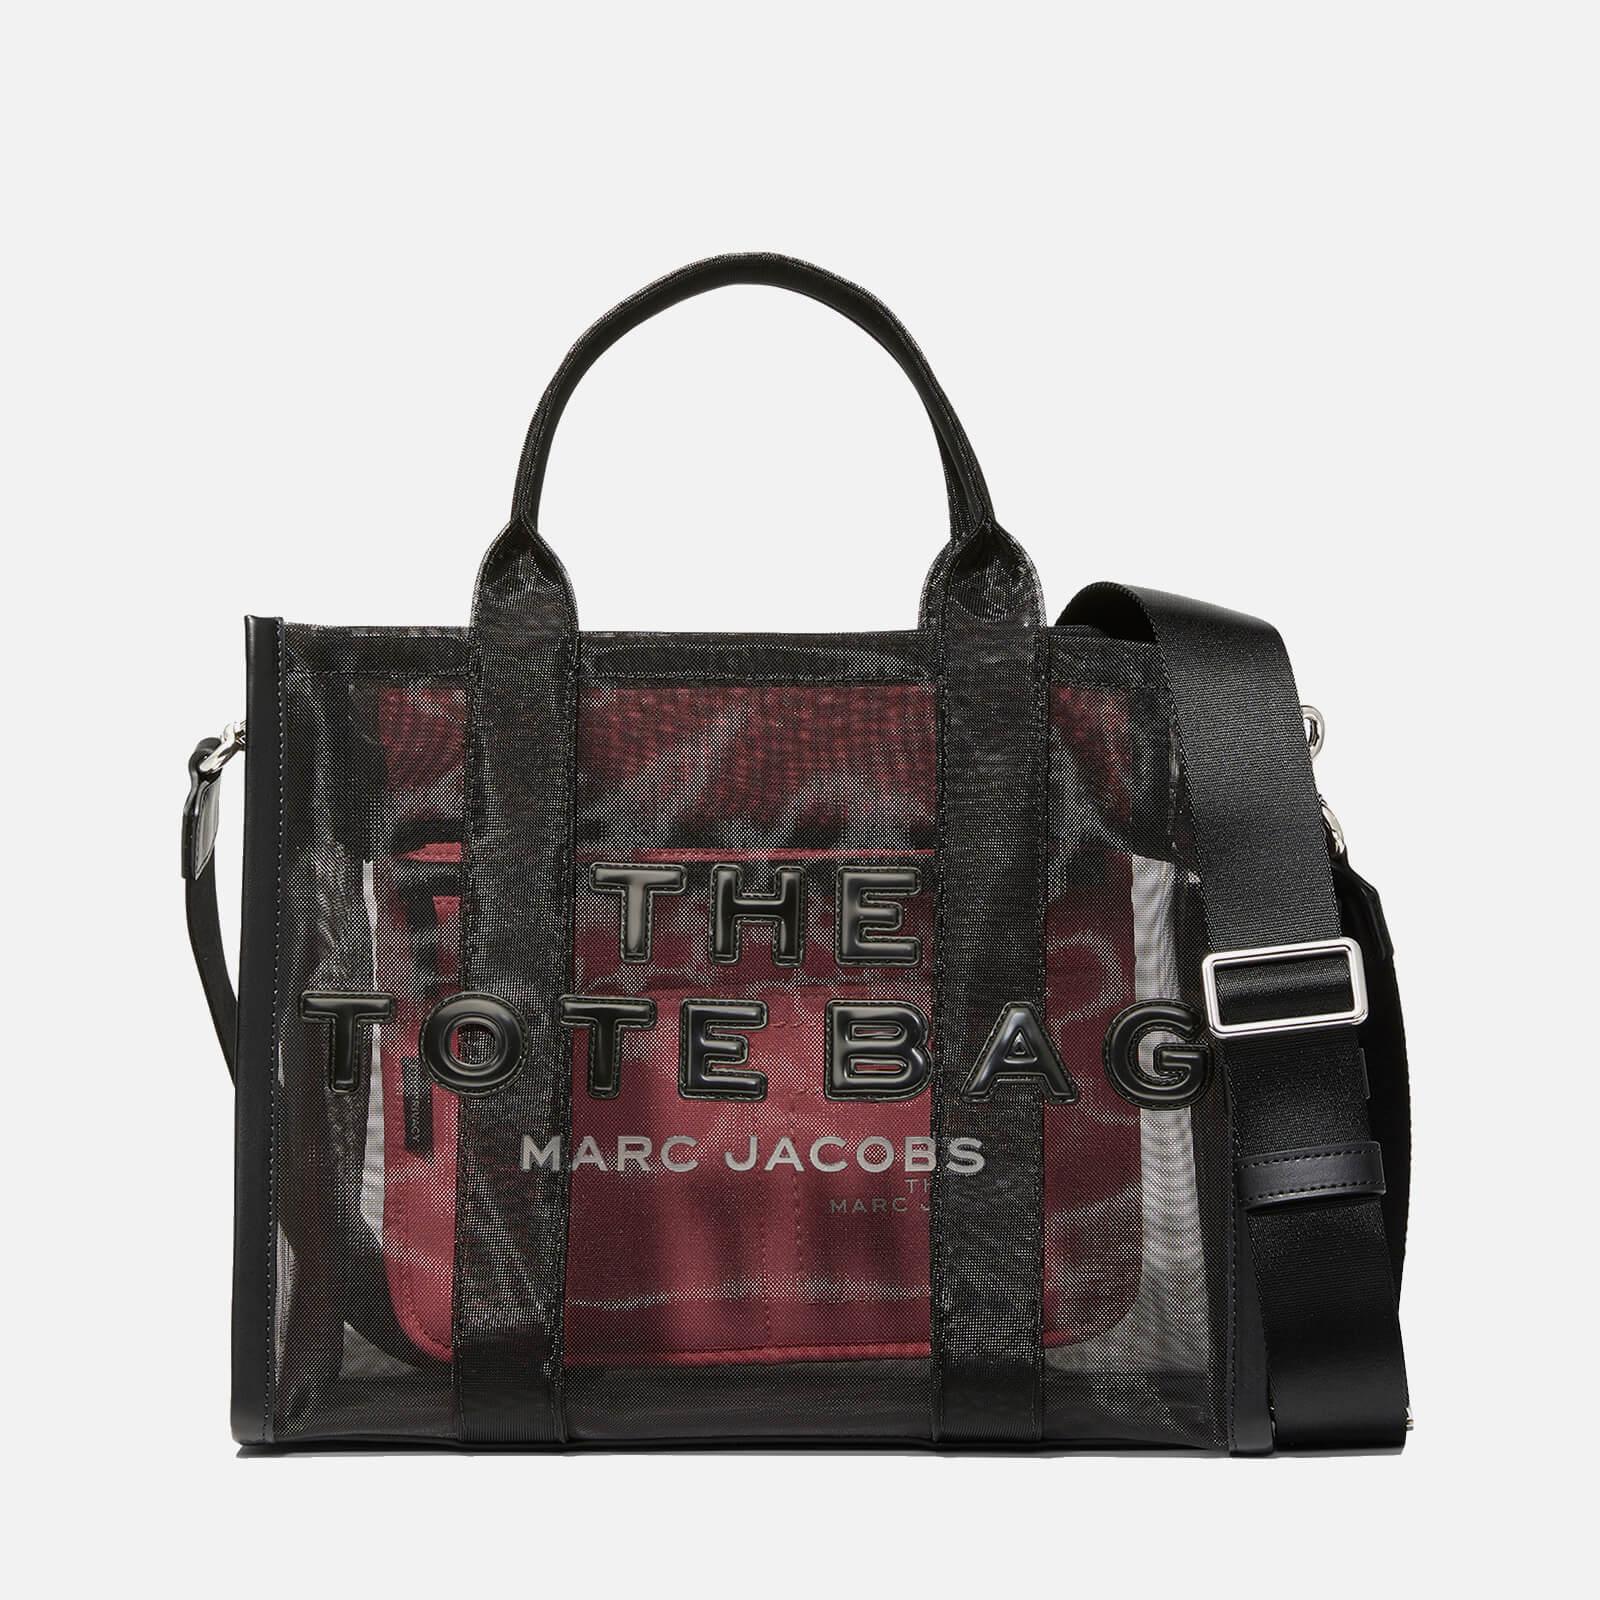 Marc Jacobs Women's Small Mesh Traveler Tote Bag - Black